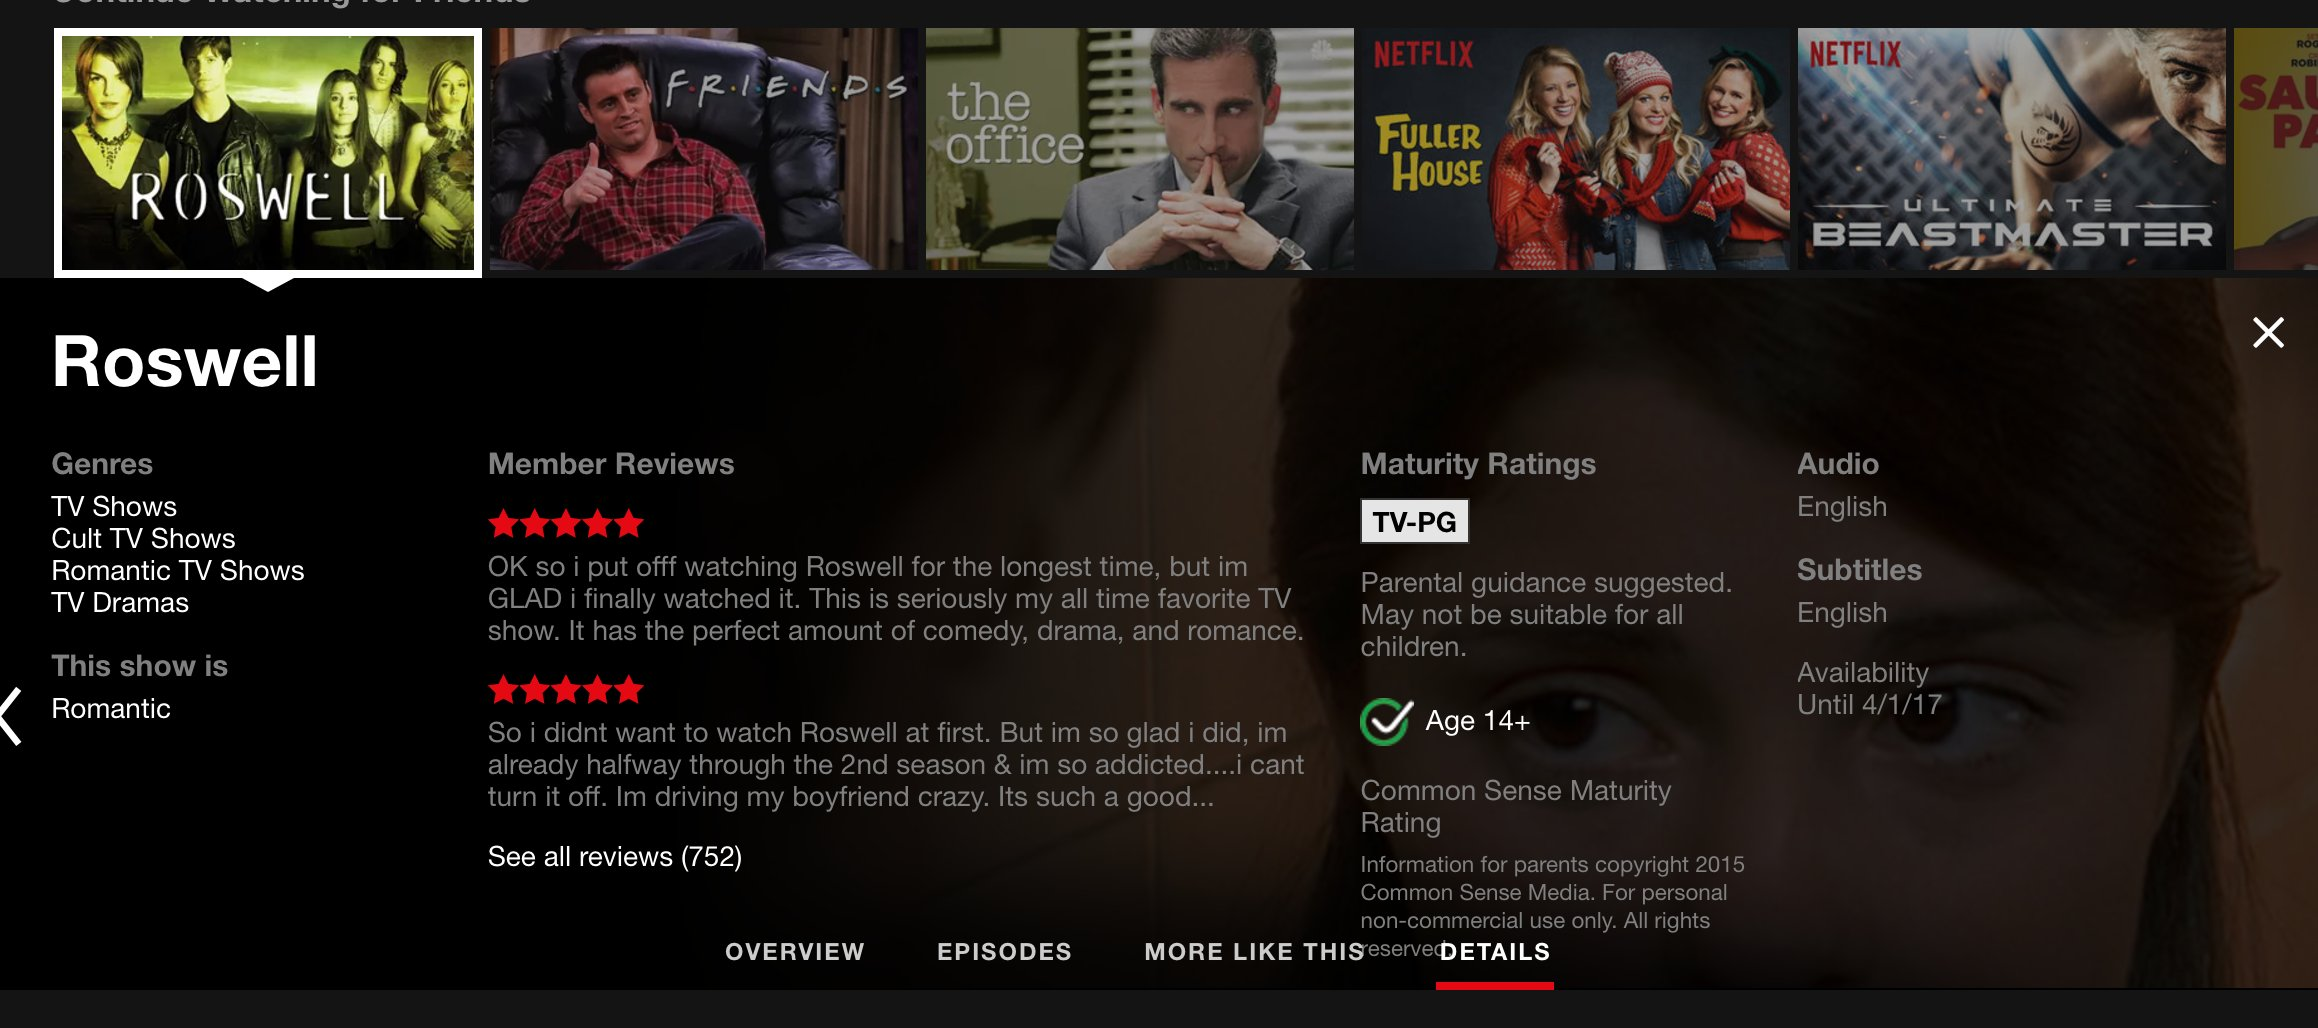 Crashdown com » Roswell » Netflix Confirms Not An April